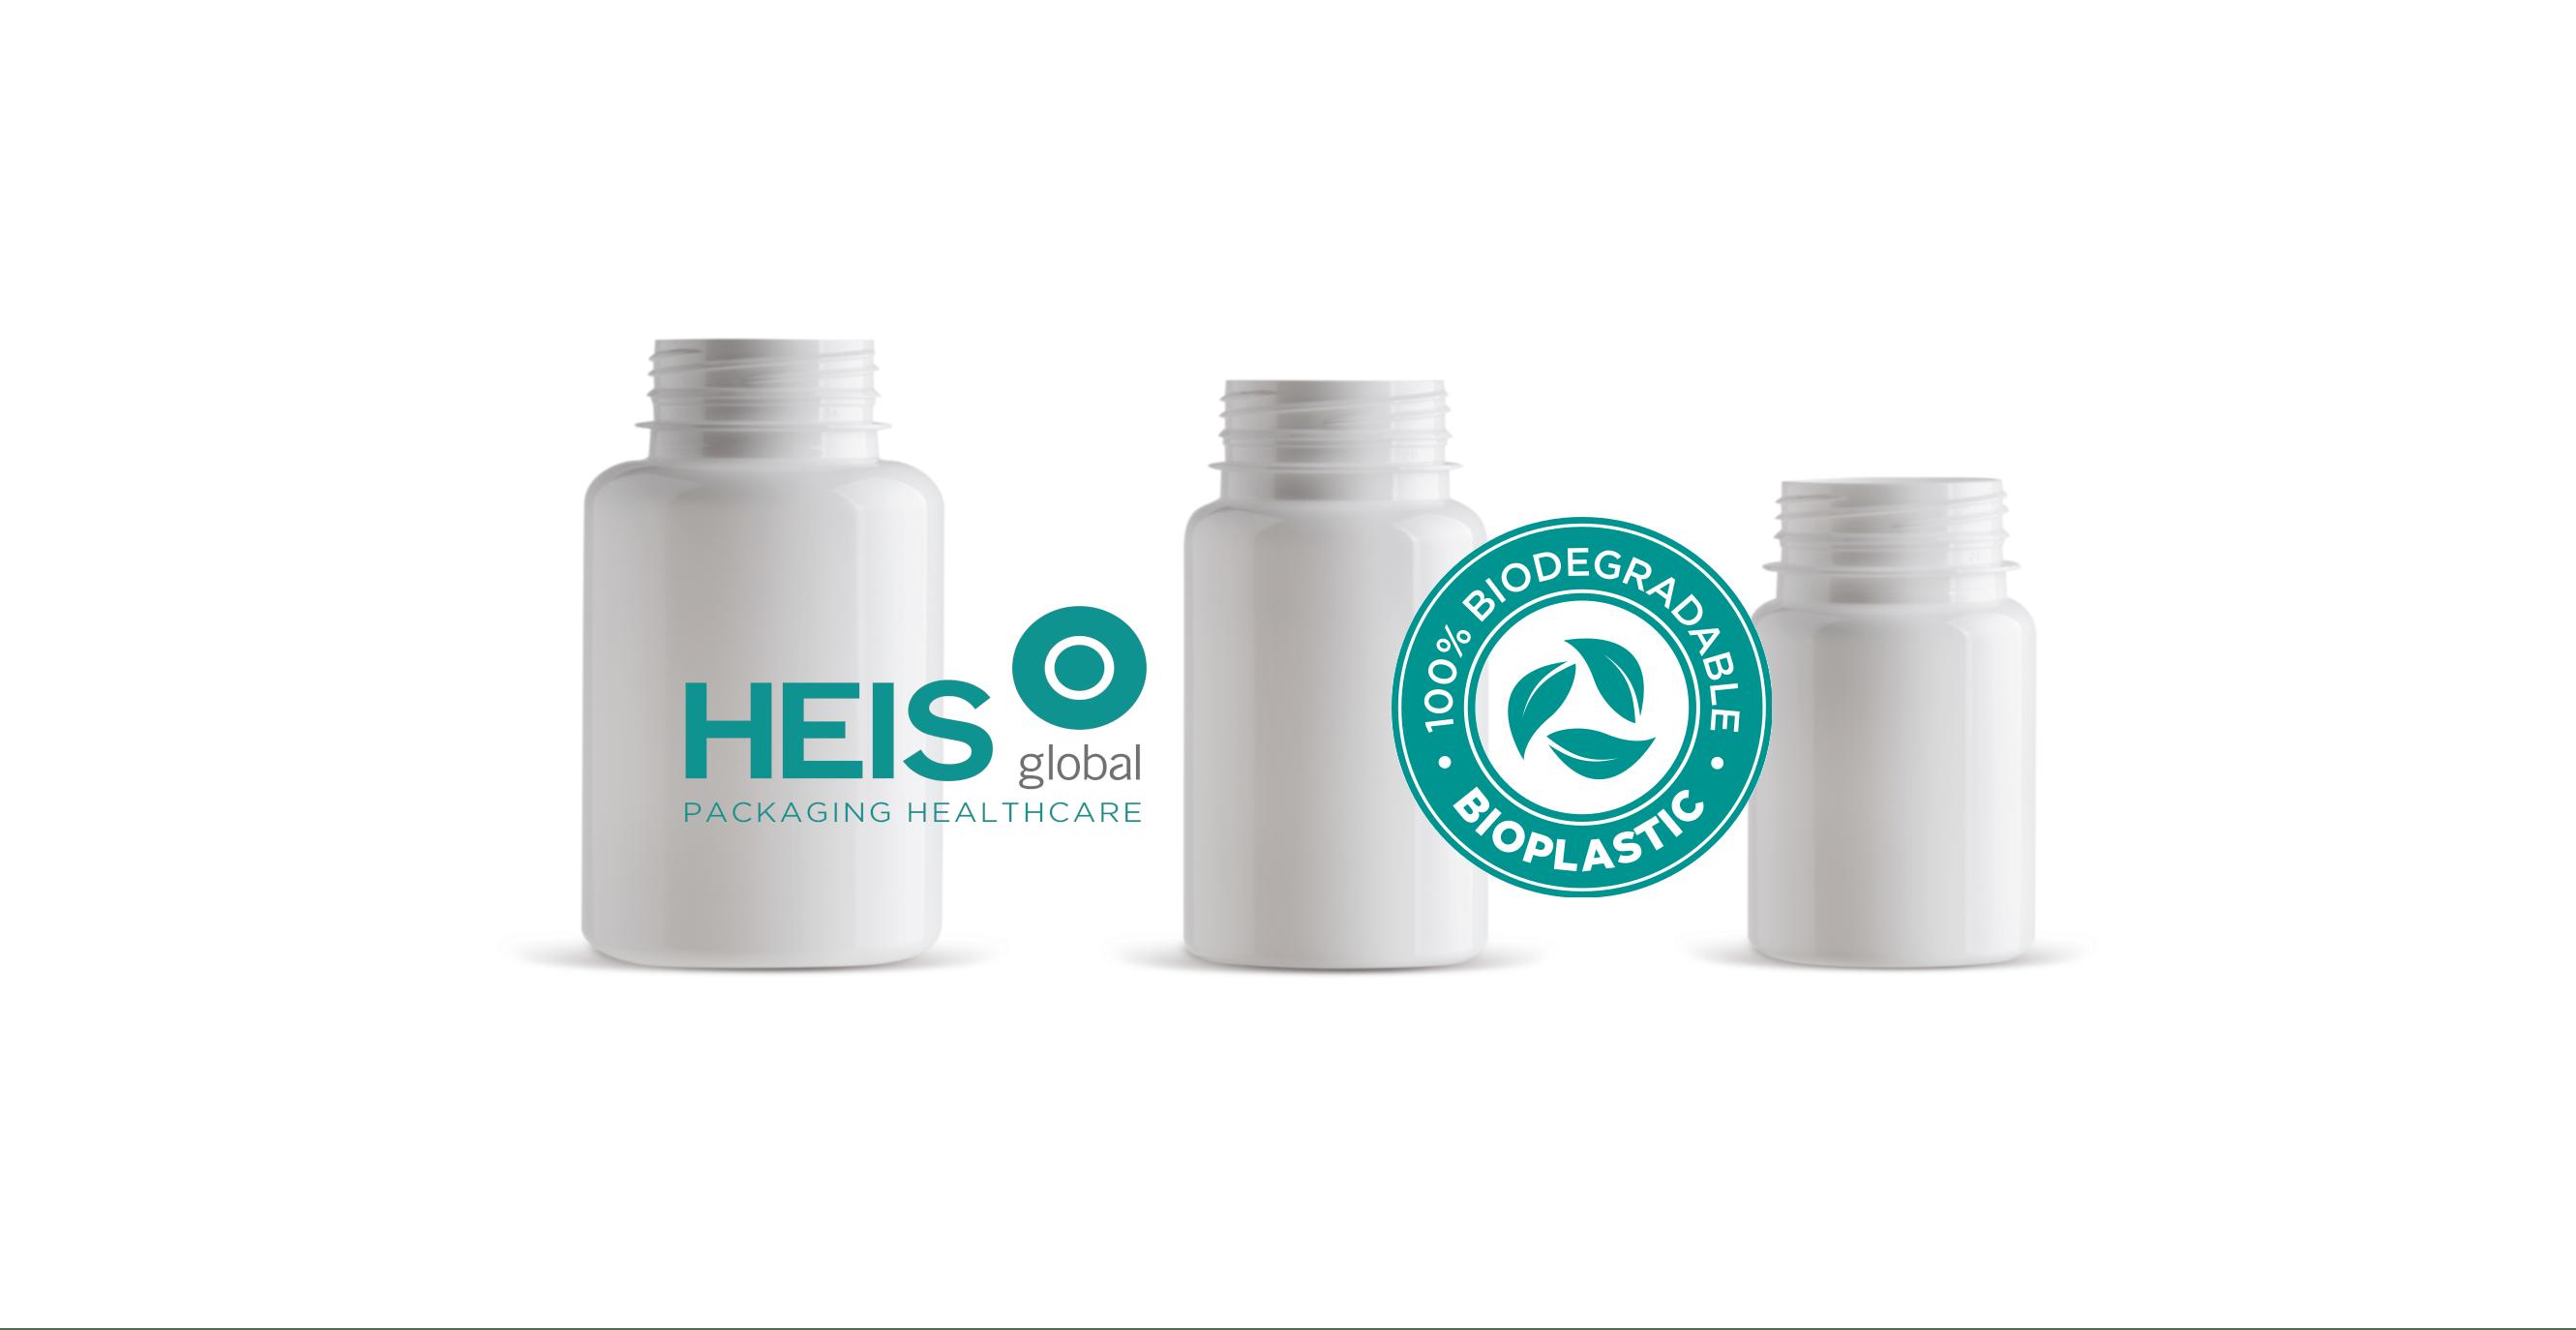 HEIS_pilljars_pharma_nutraceutcics_biodegradable_label_v2